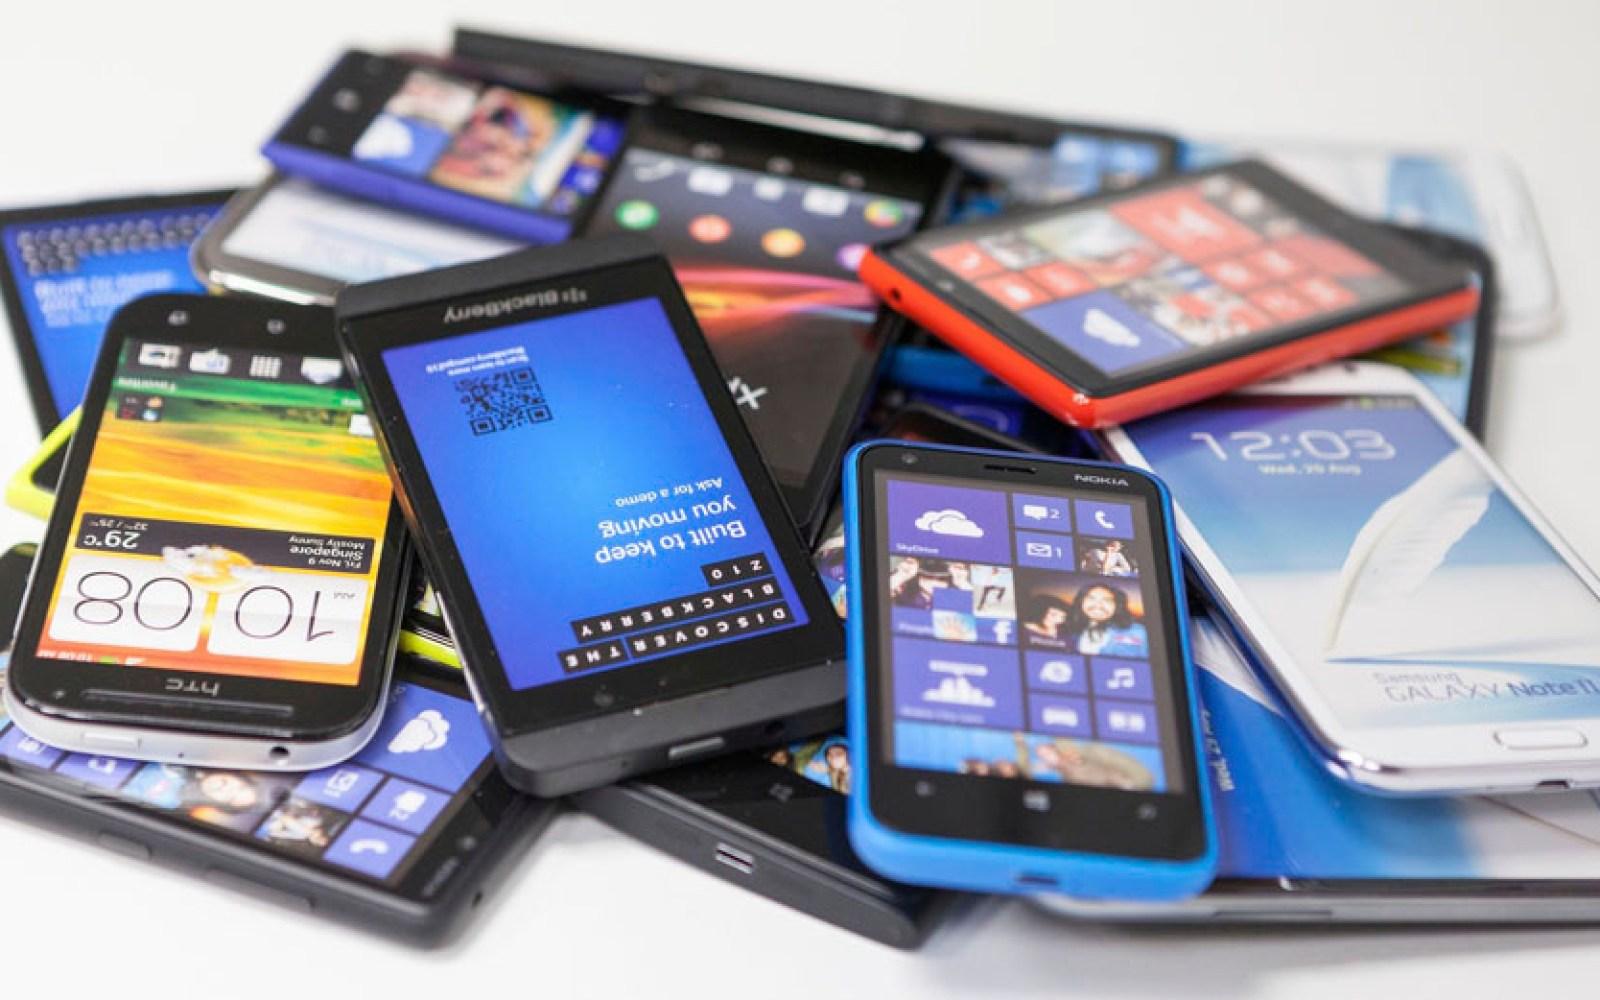 A billion smartphones were sold last year, says IDC